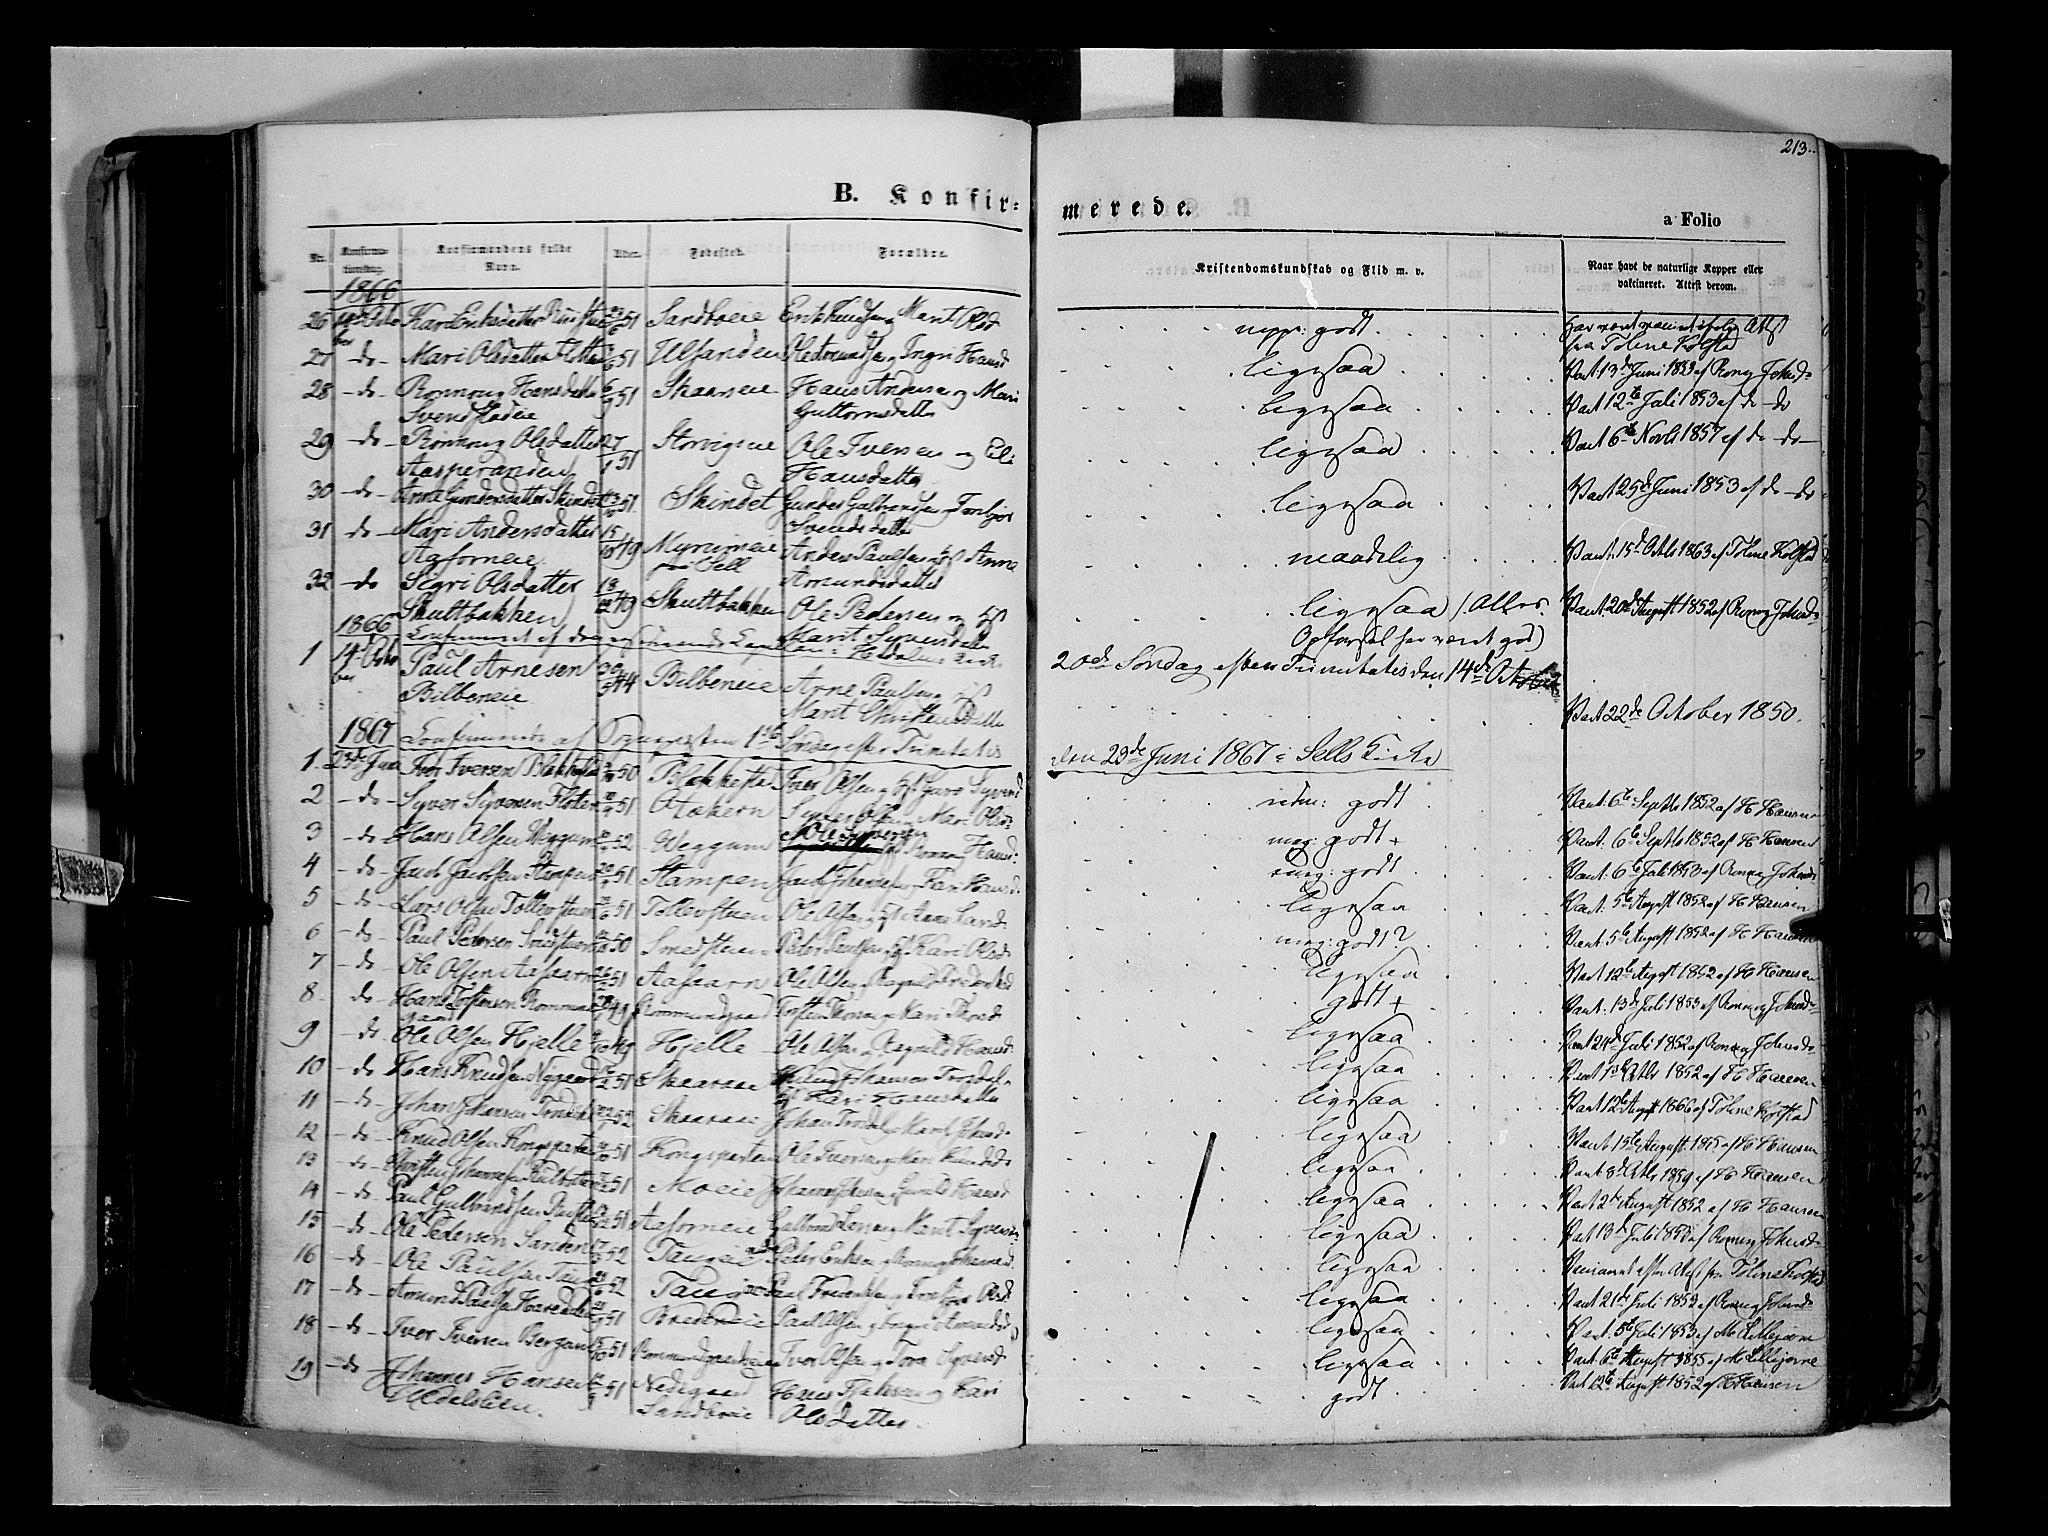 SAH, Vågå prestekontor, Ministerialbok nr. 6 /1, 1856-1872, s. 213